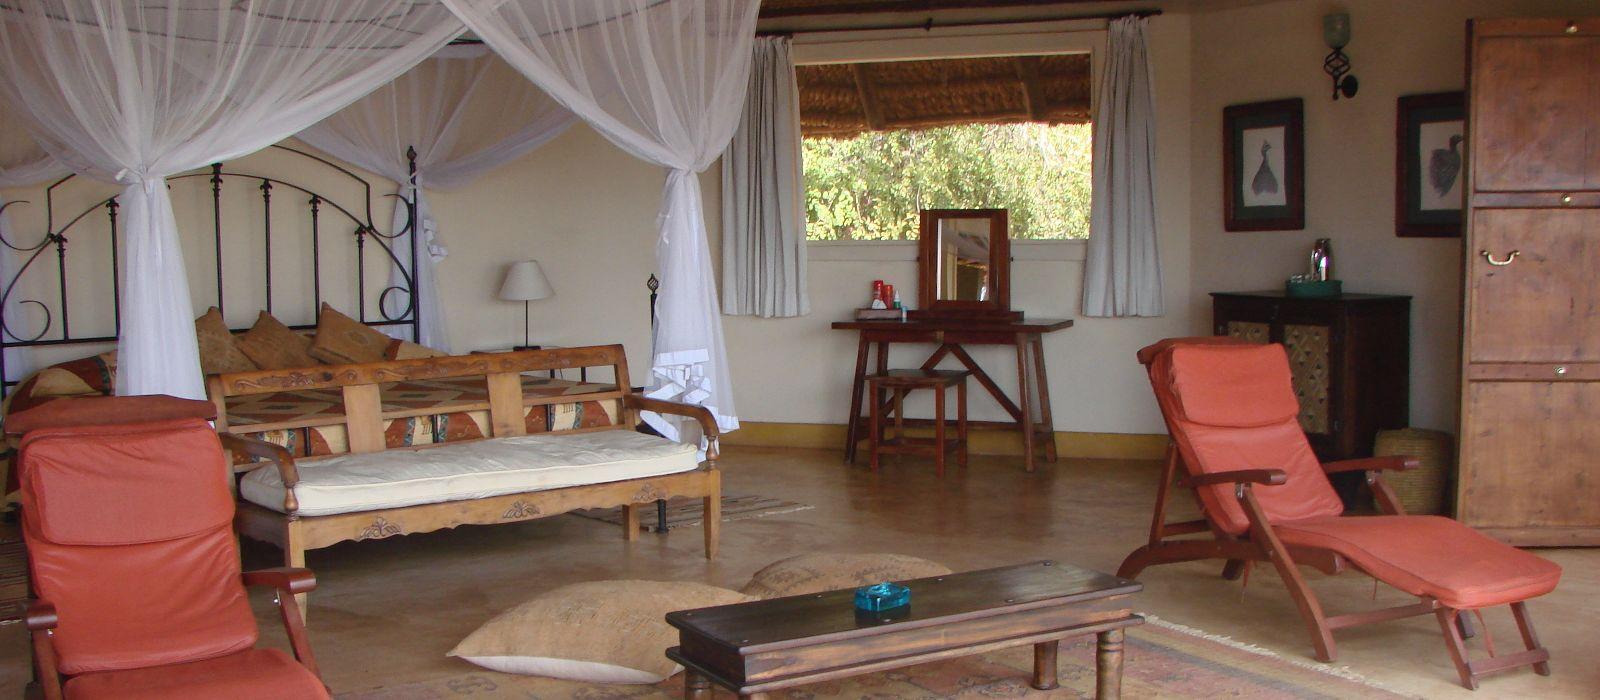 Hotel Elsas Kopje Kenia